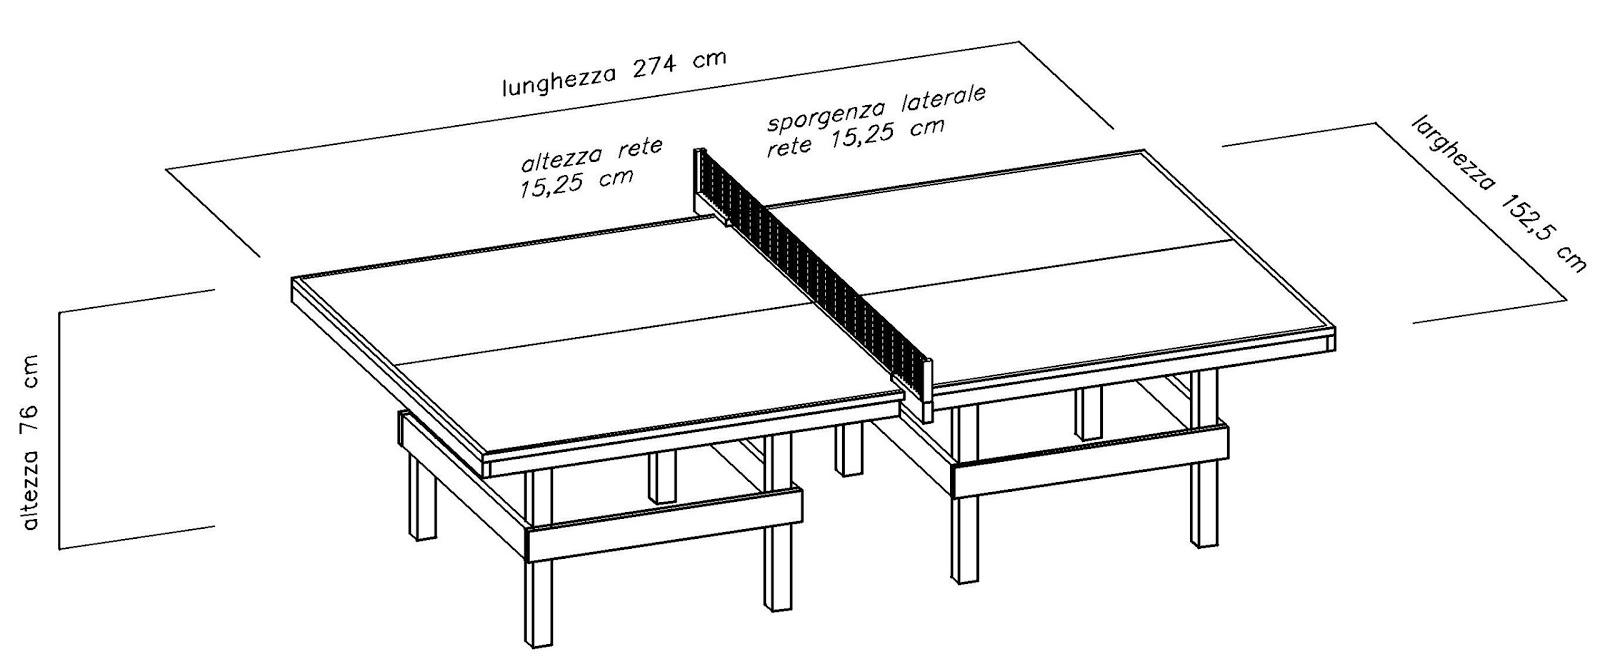 Costruire facile come costruire un tavolo da ping pong - Tavolo da ping pong ...